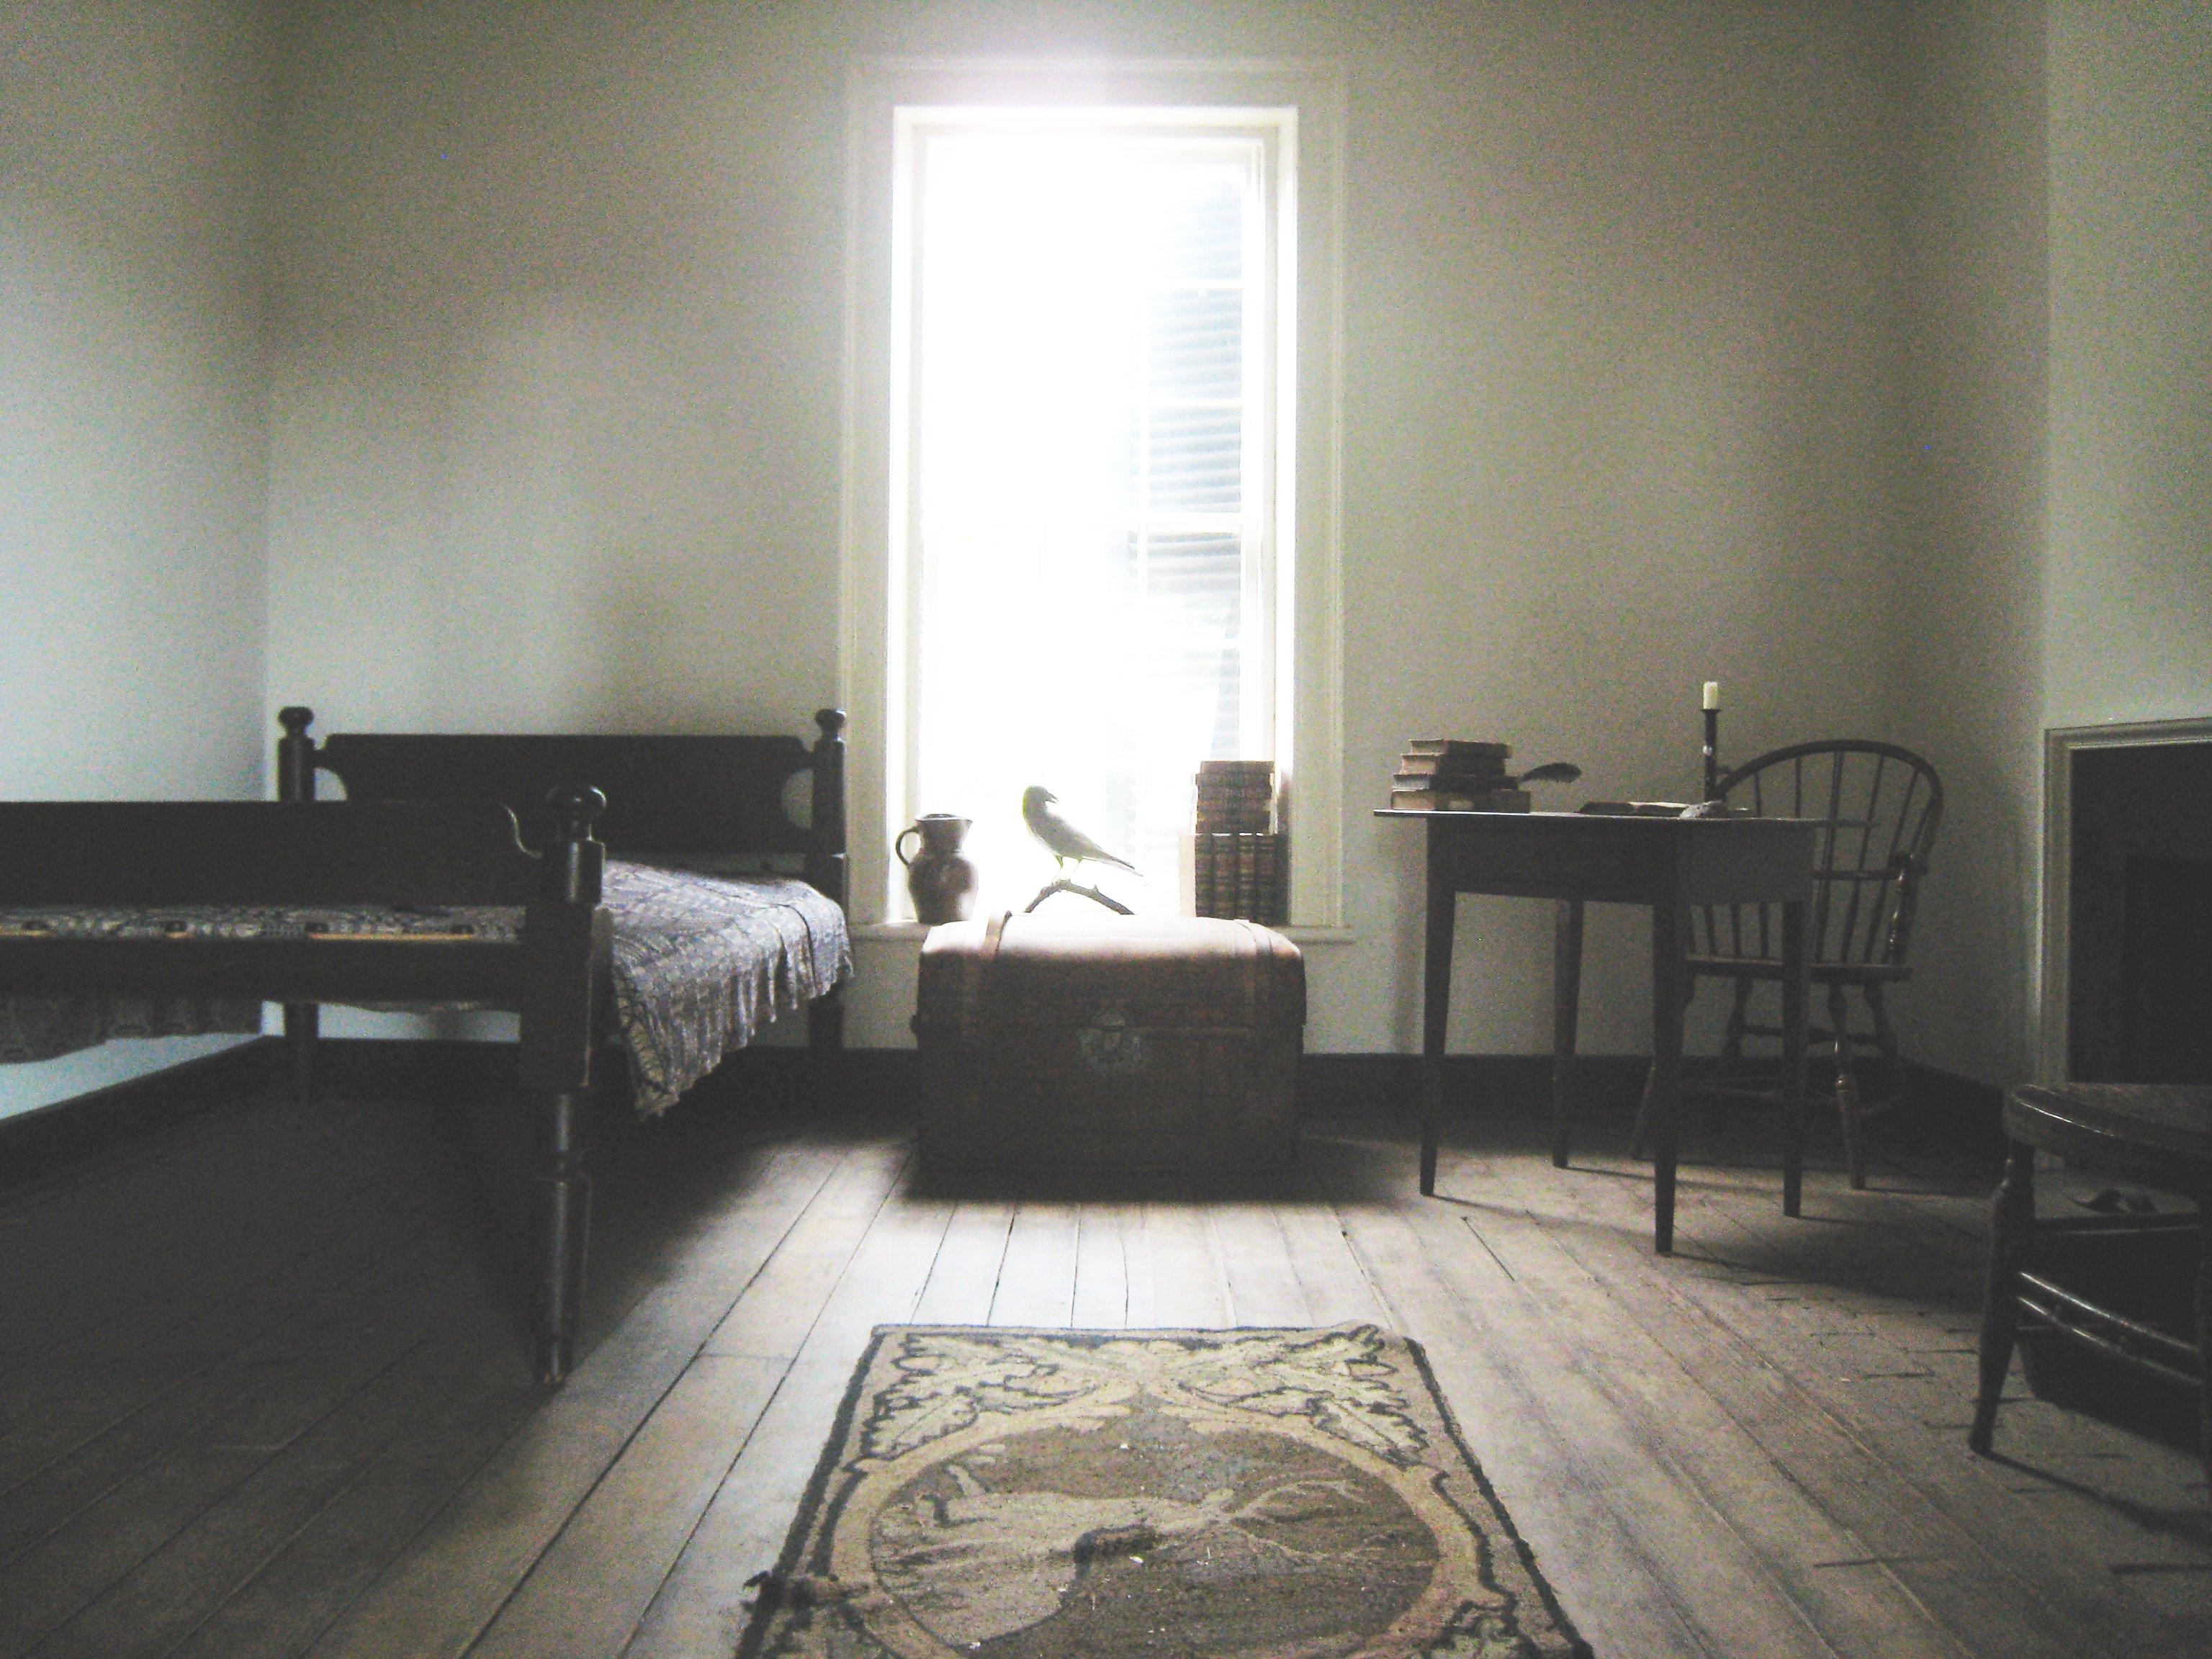 Poe Room University of Virginia